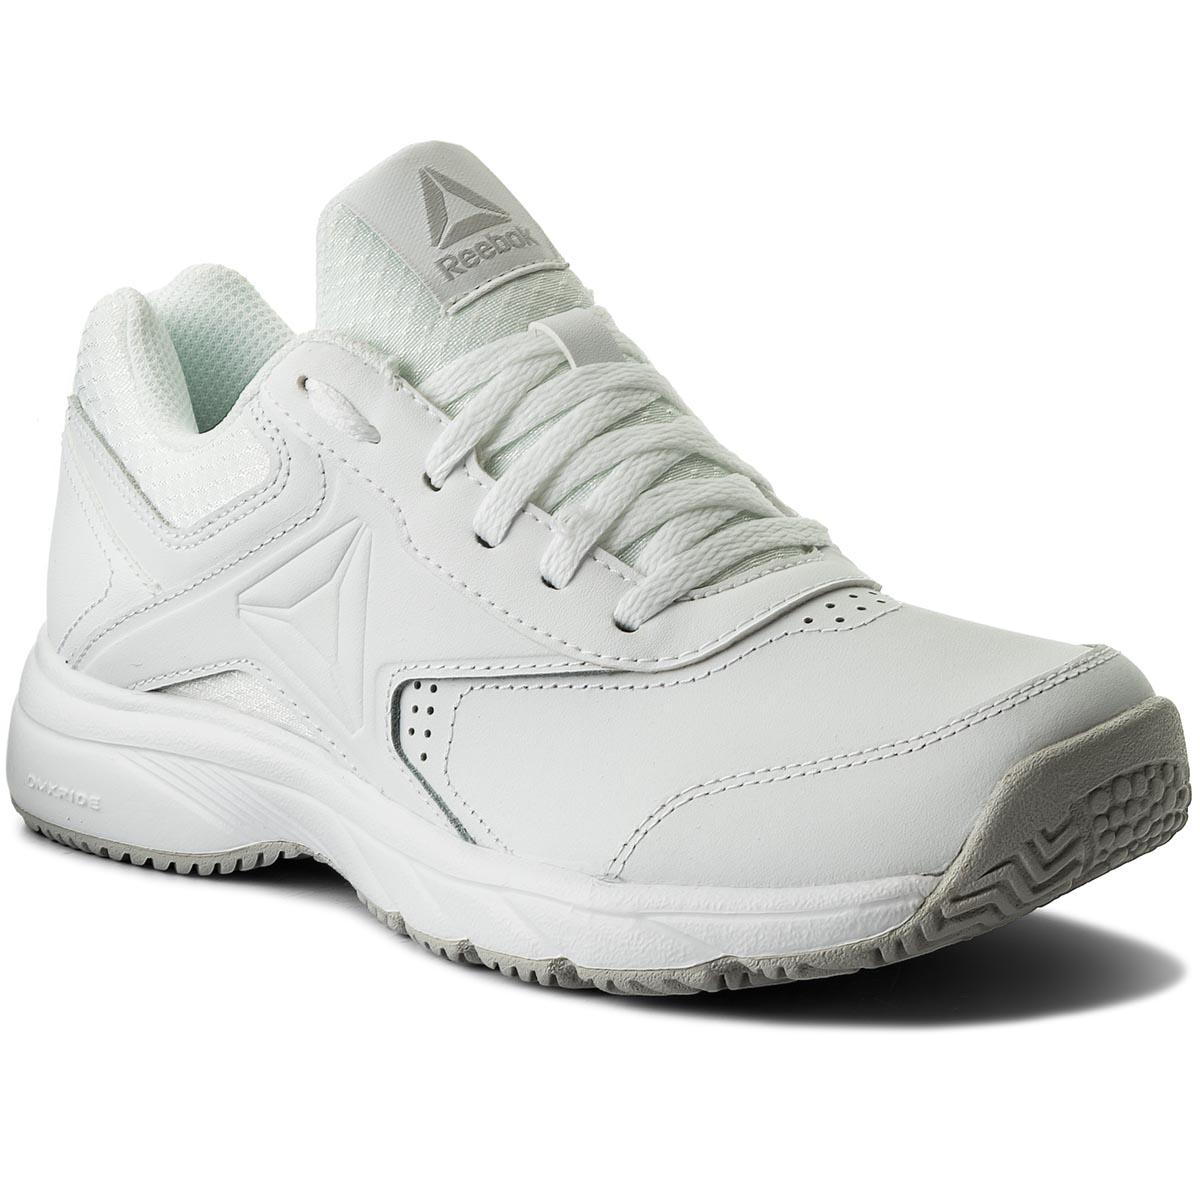 c1fd8b067580c Topánky Reebok - Work N Cushion 3.0 BS9525 White/Steel - Glami.sk